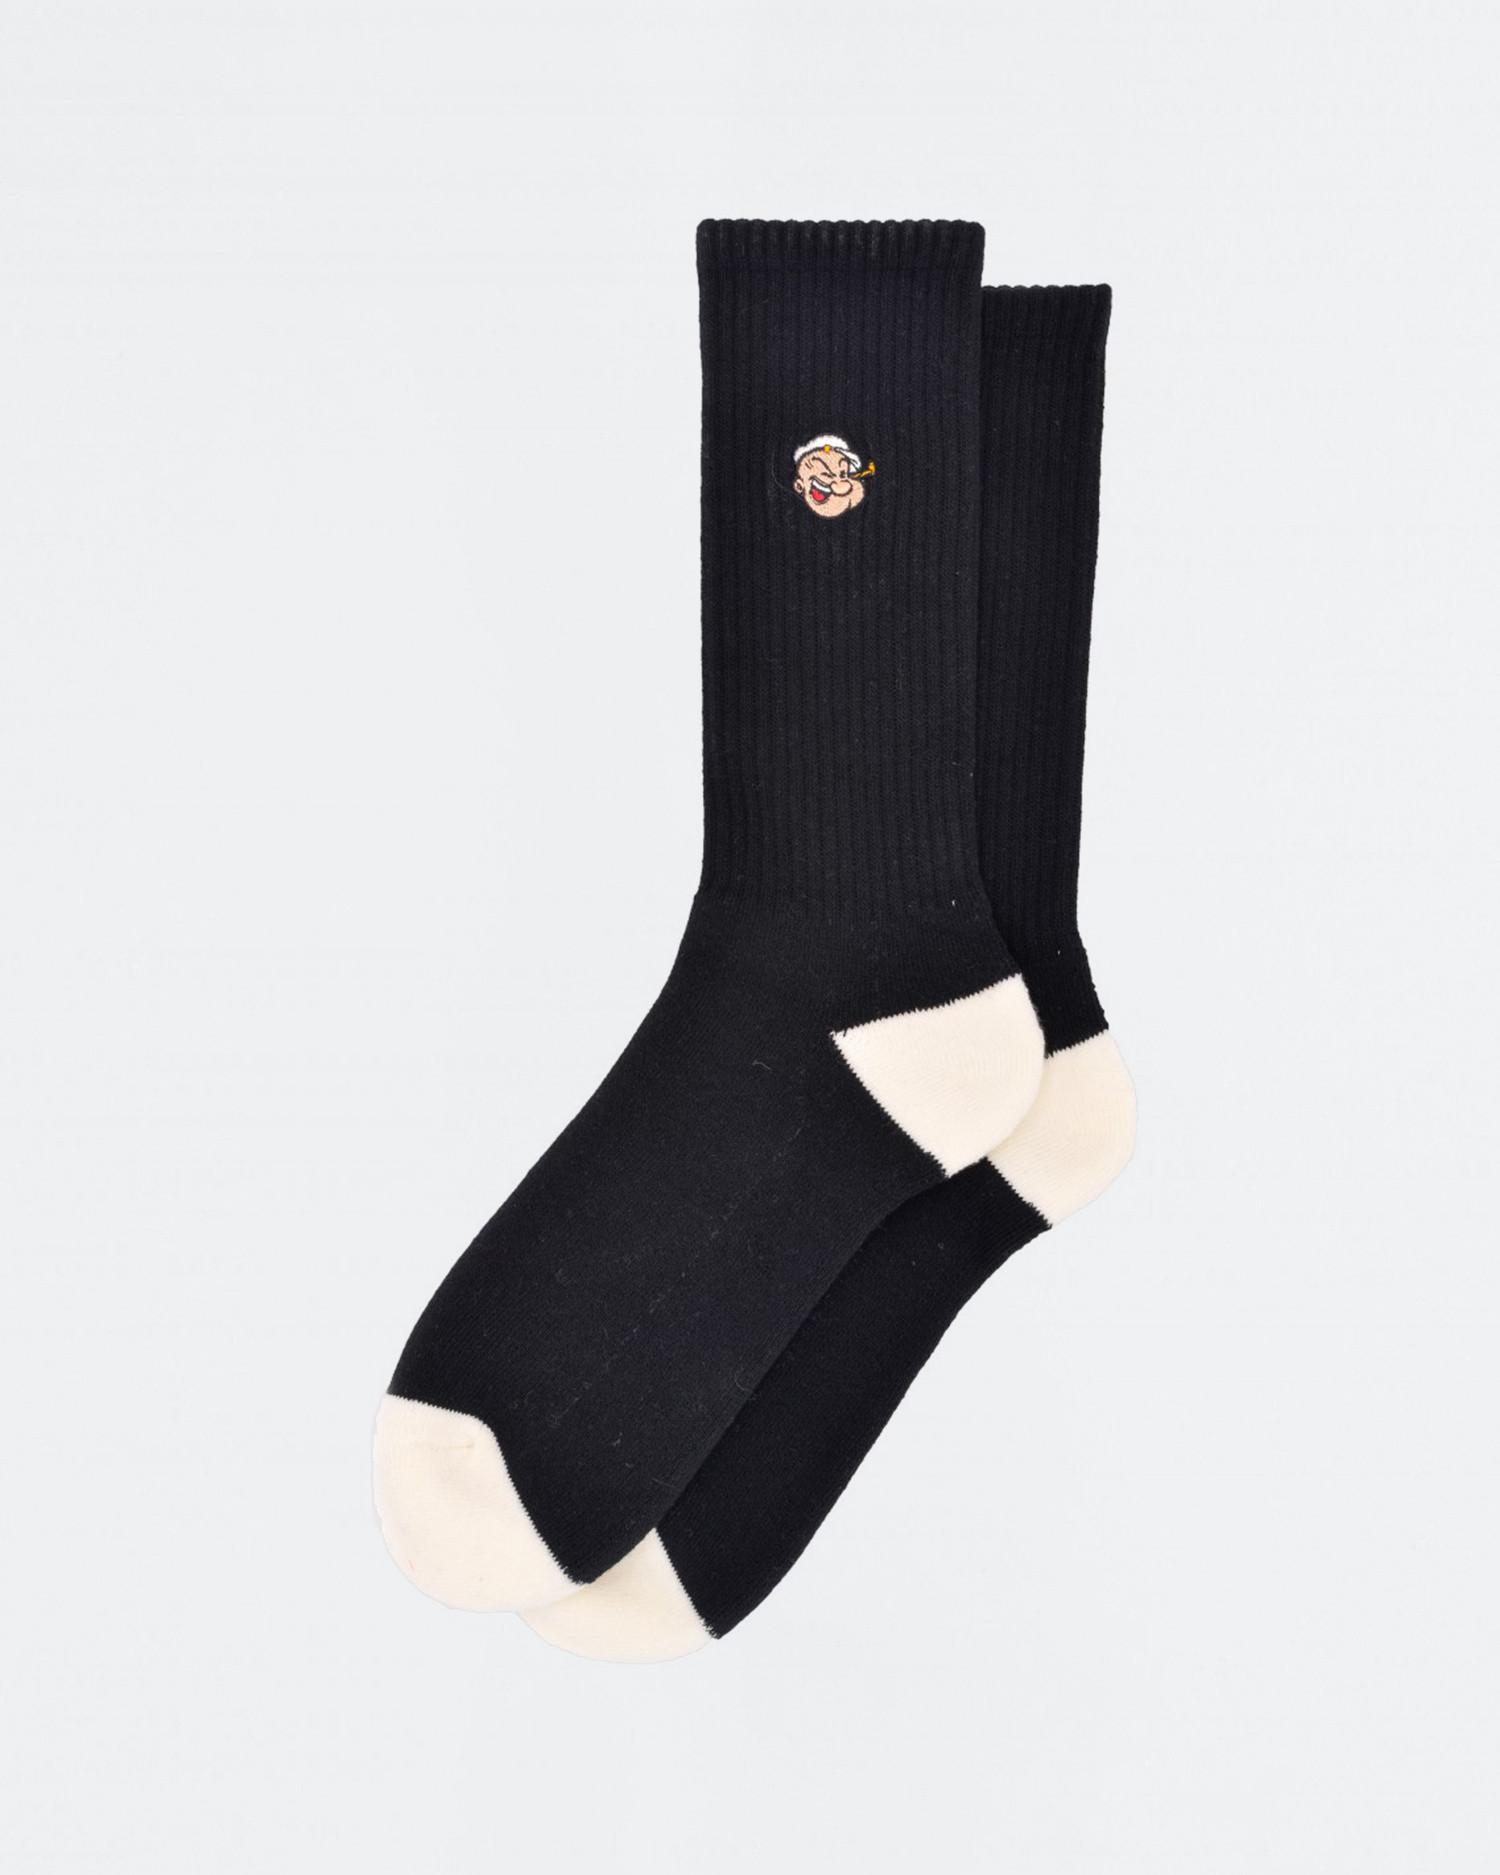 Pop Trading Co X Popeye Sport Socks Black